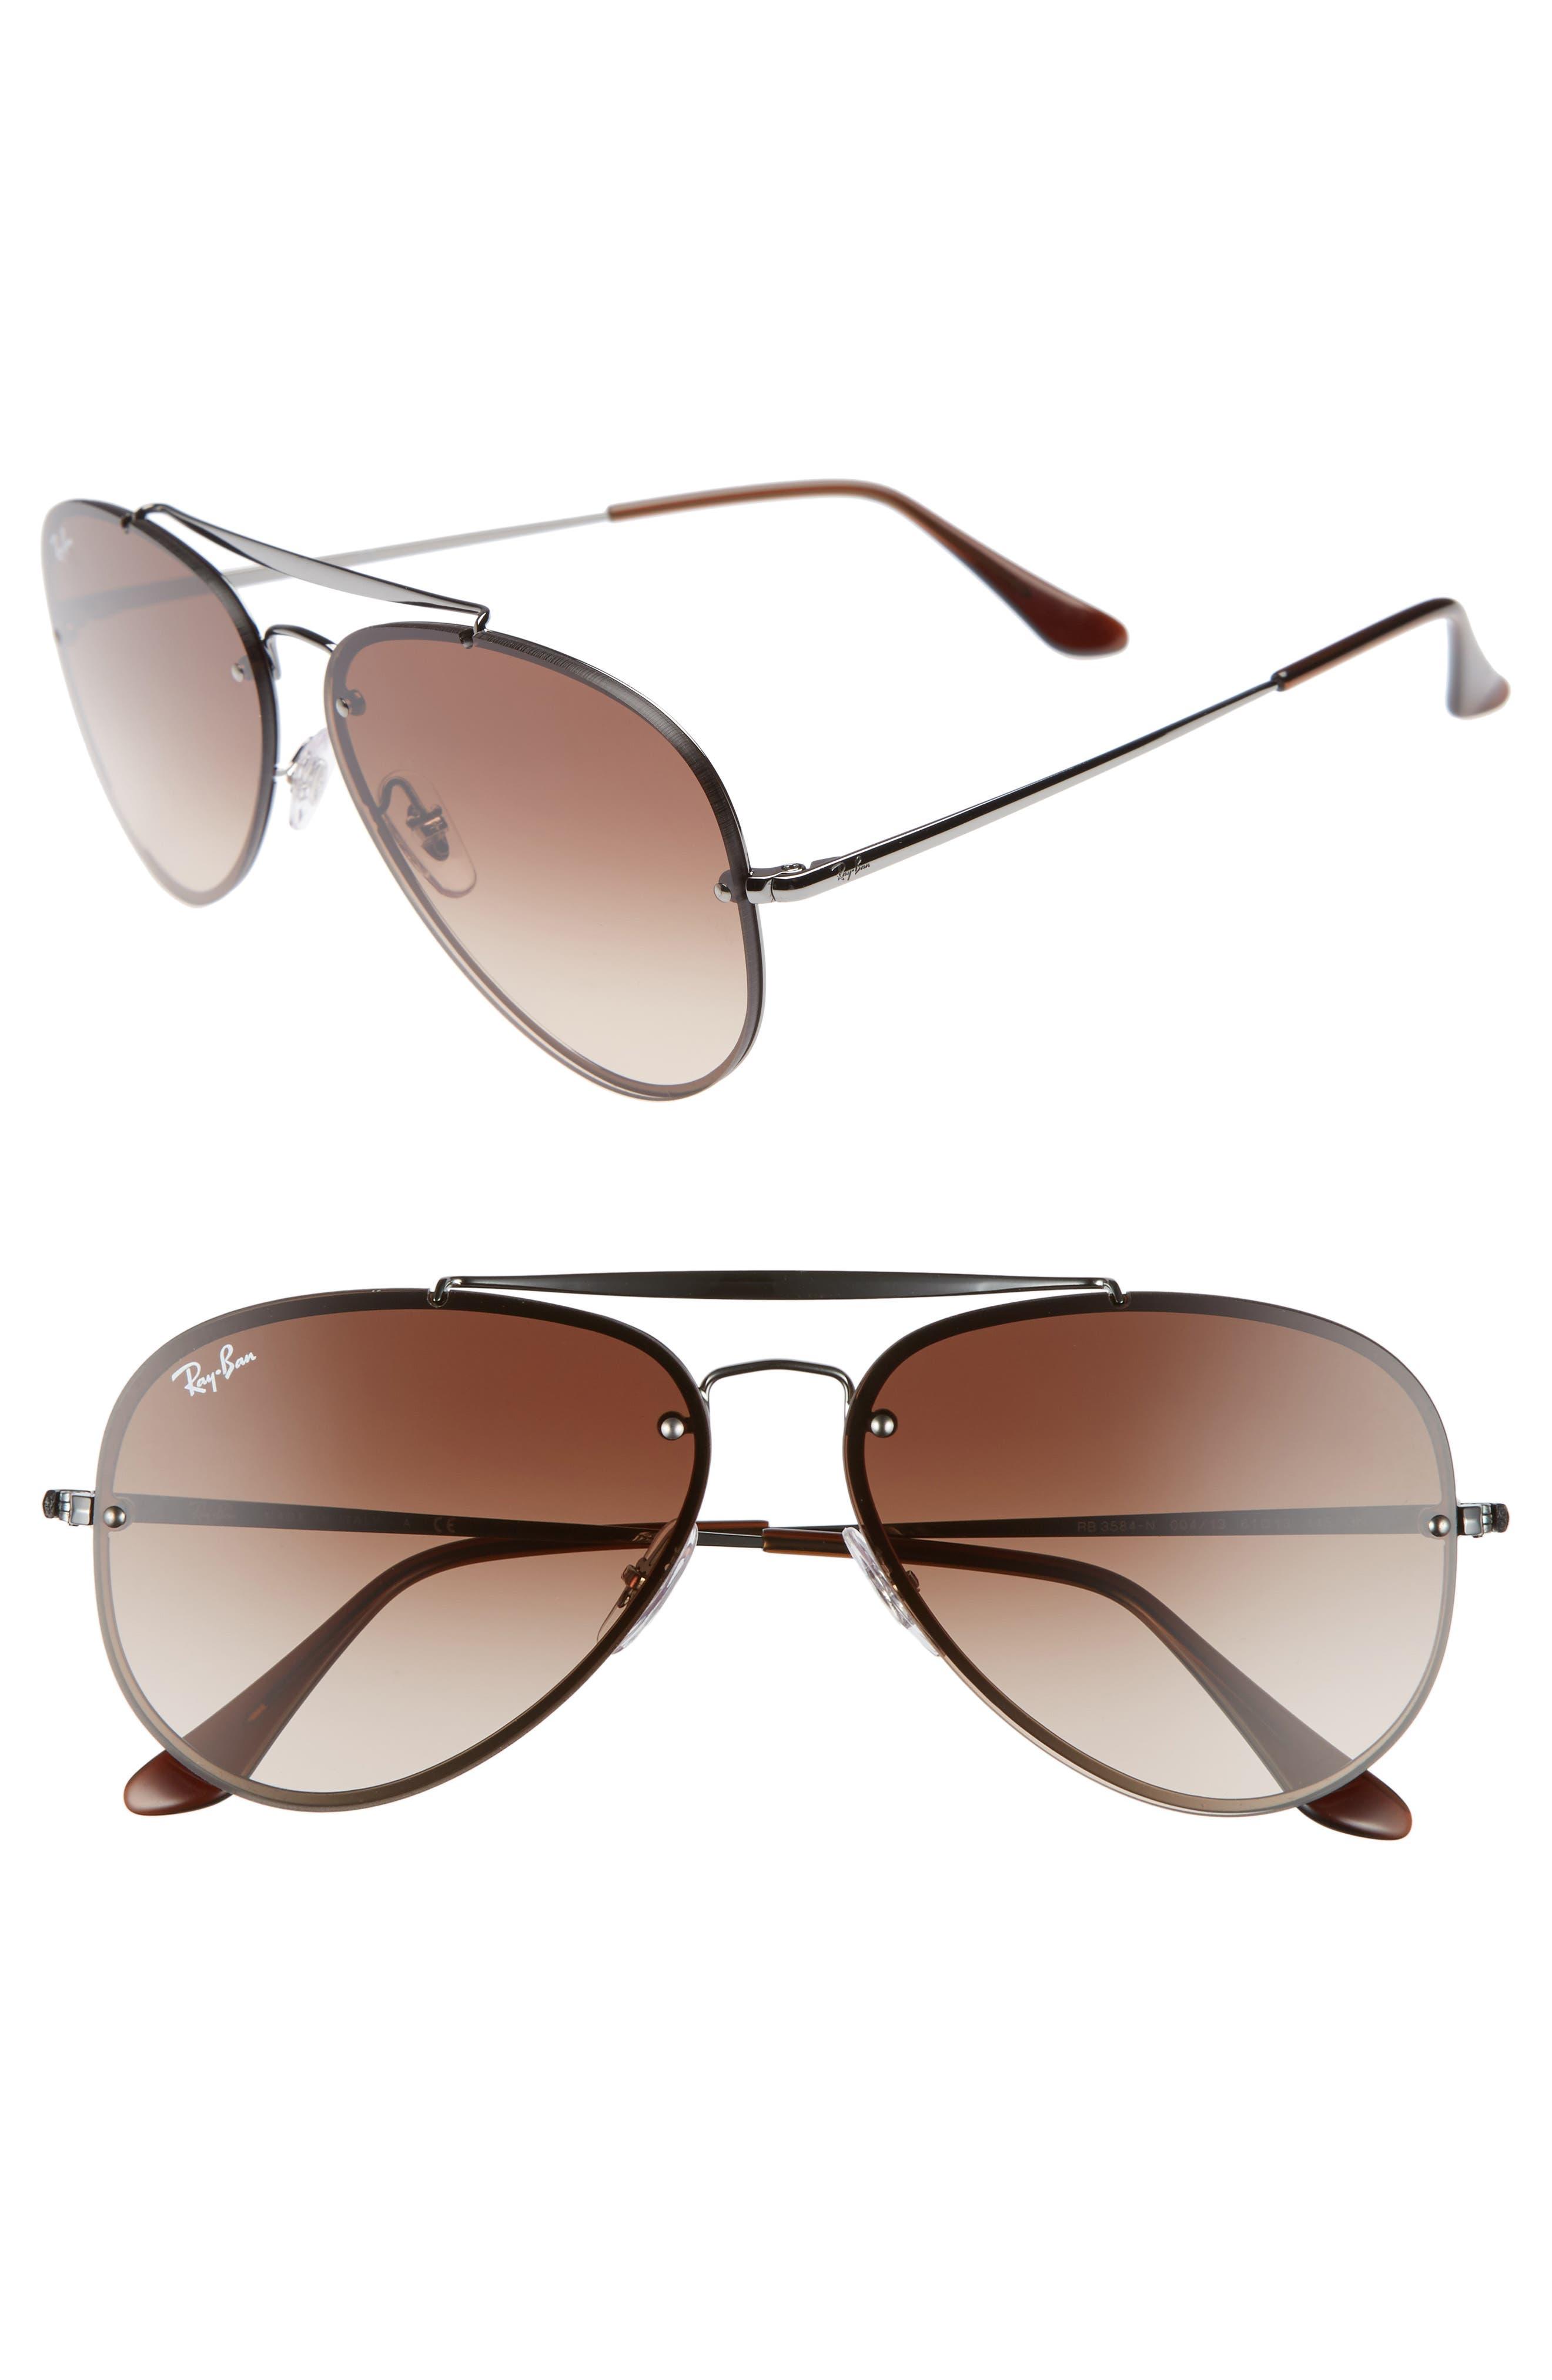 Ray-Ban Blaze 61mm Aviator Sunglasses